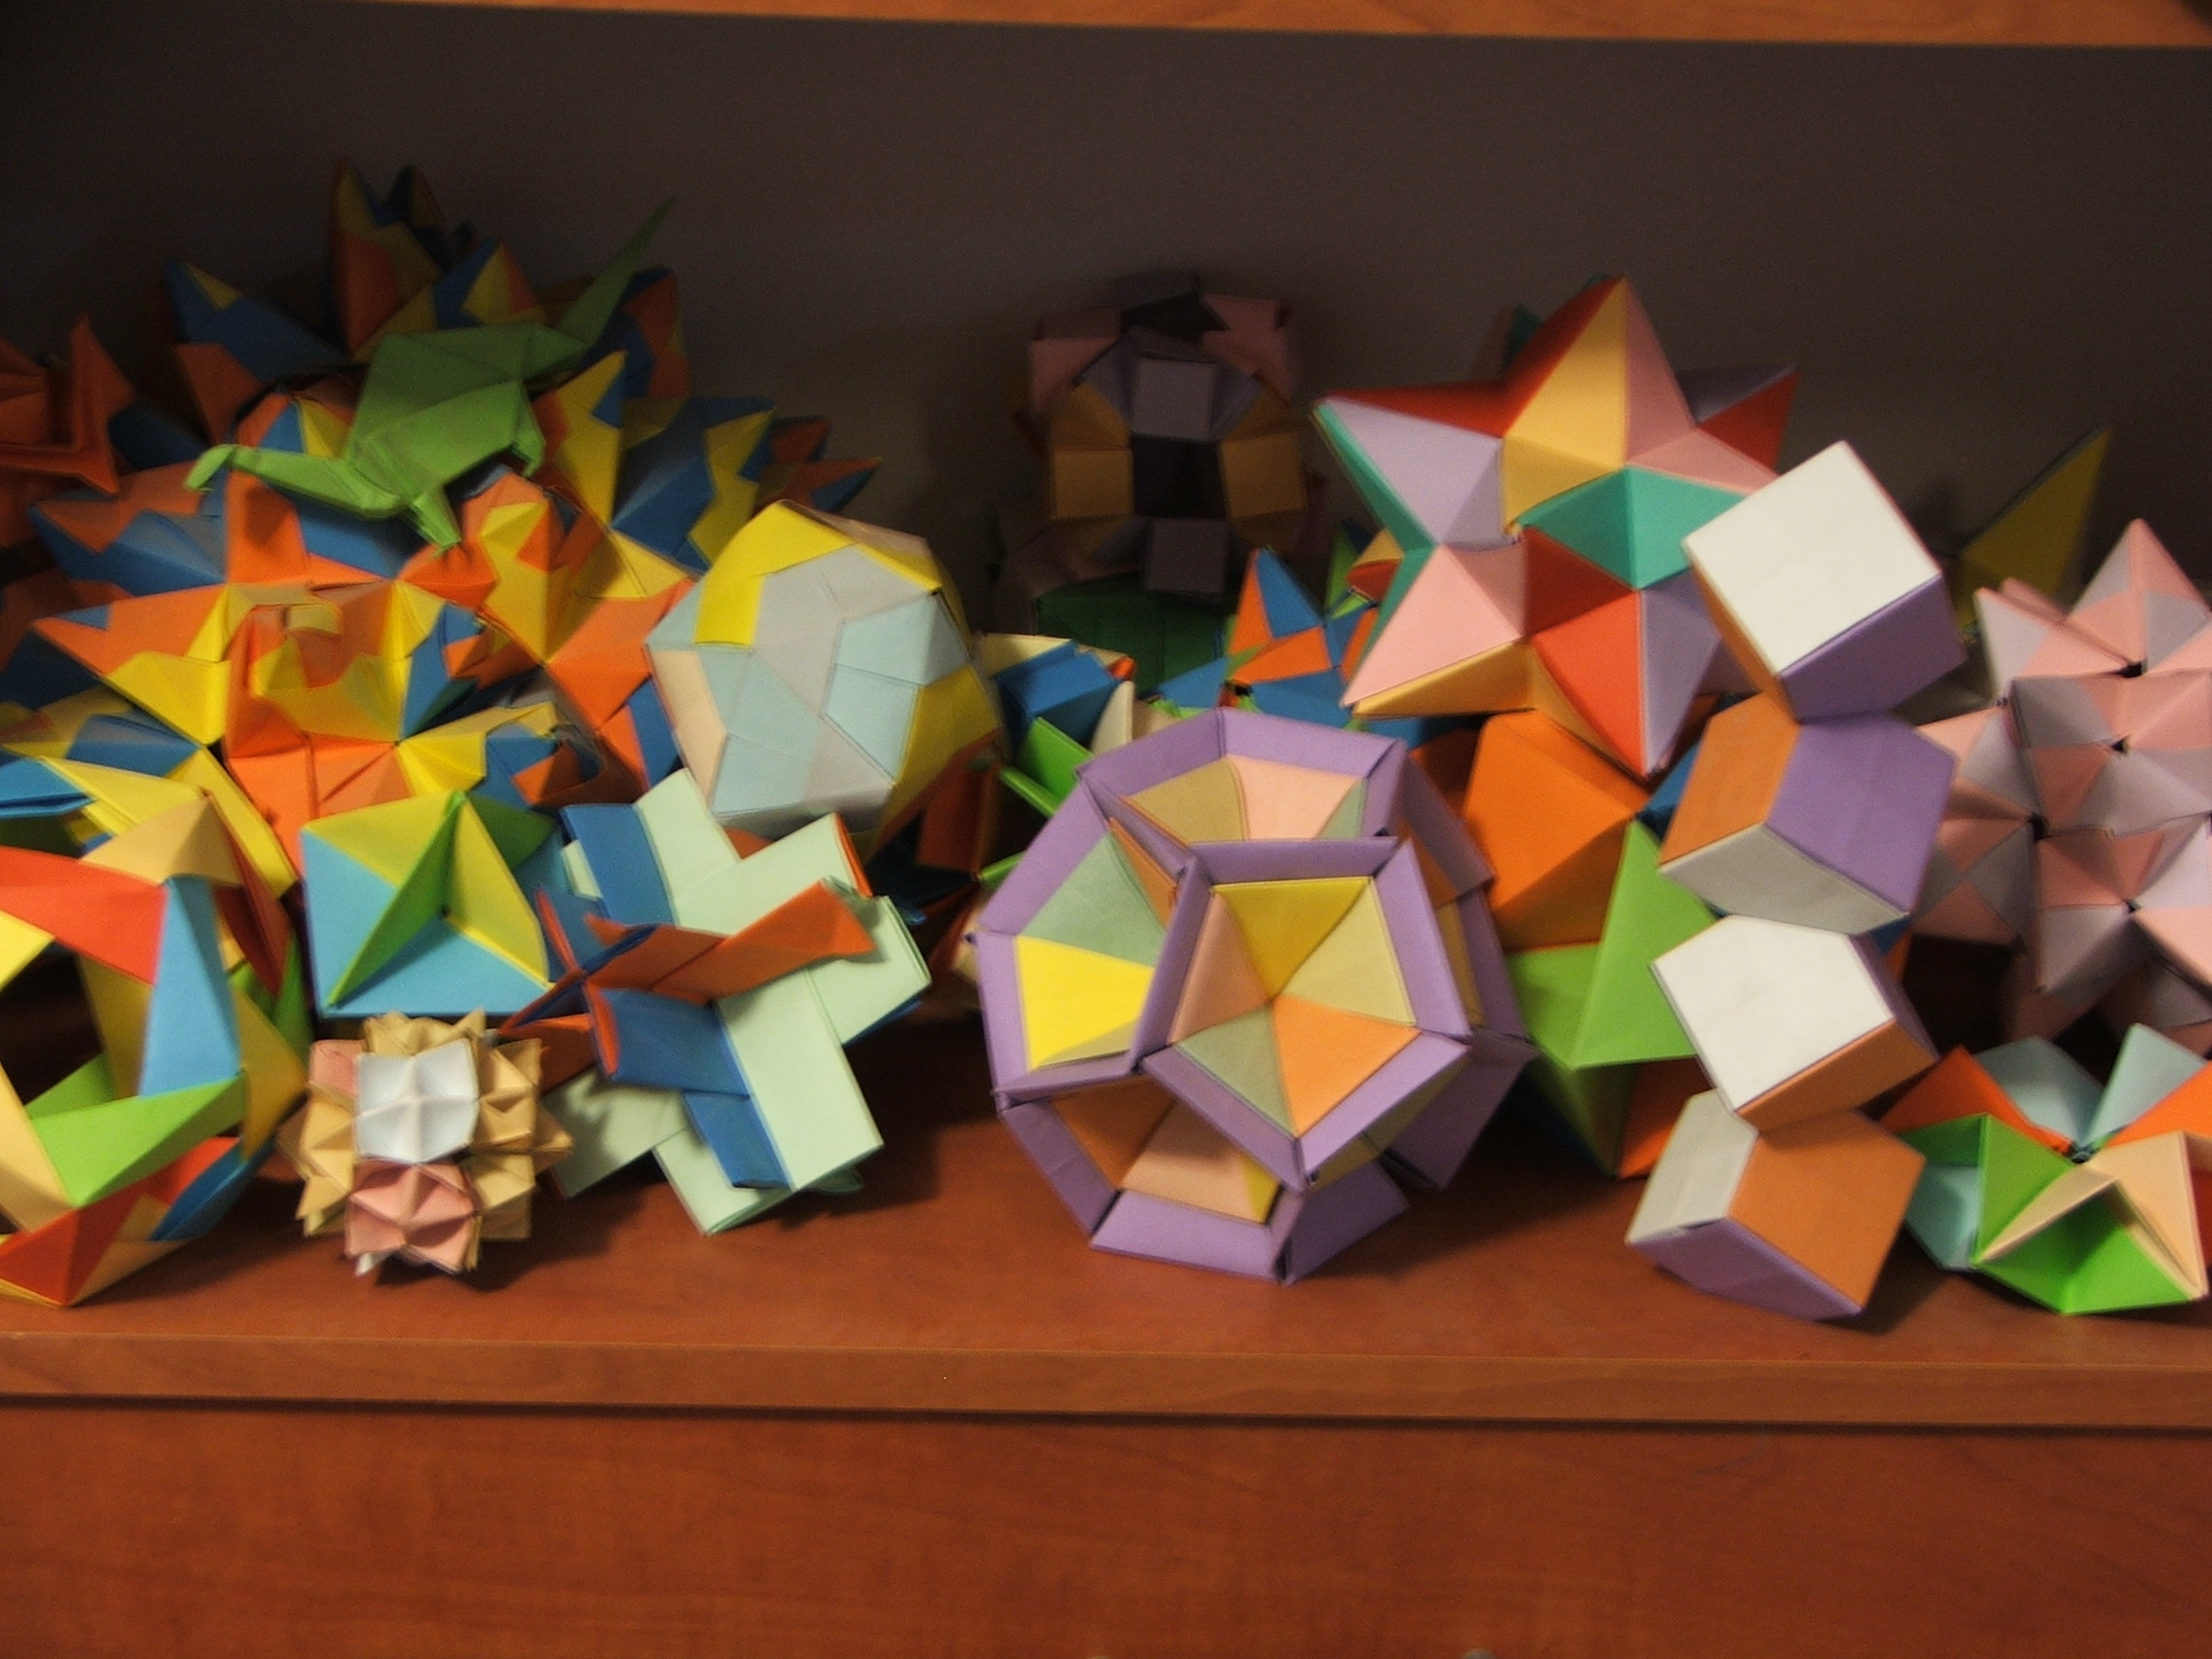 модульное оригами схема подставки